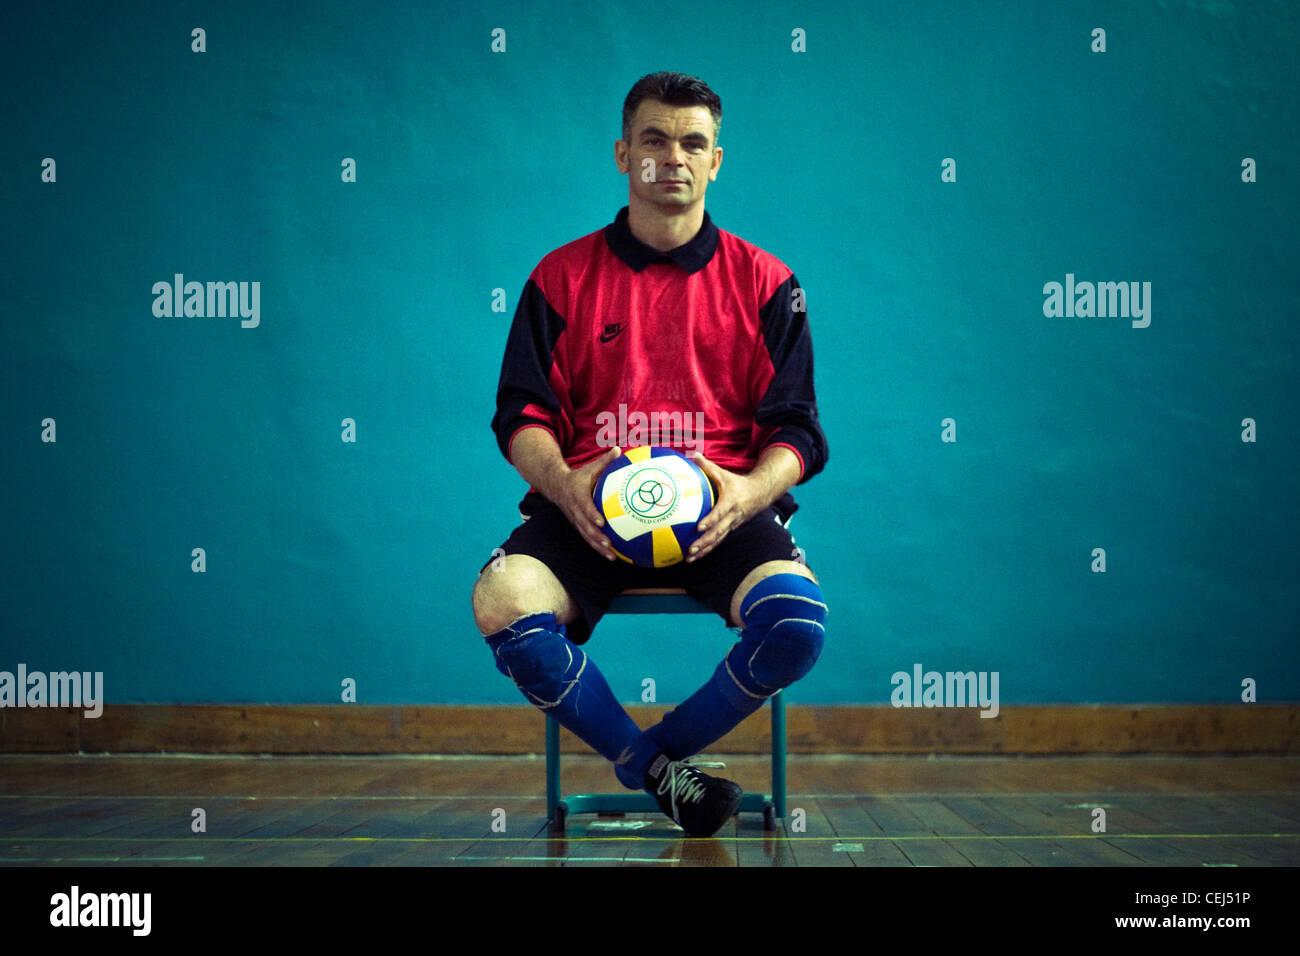 Color art fojnica - Esad Durmisevic A Member Of Bosnian Sitting Volleyball Team Fojnica Bosnia And Herzegovina